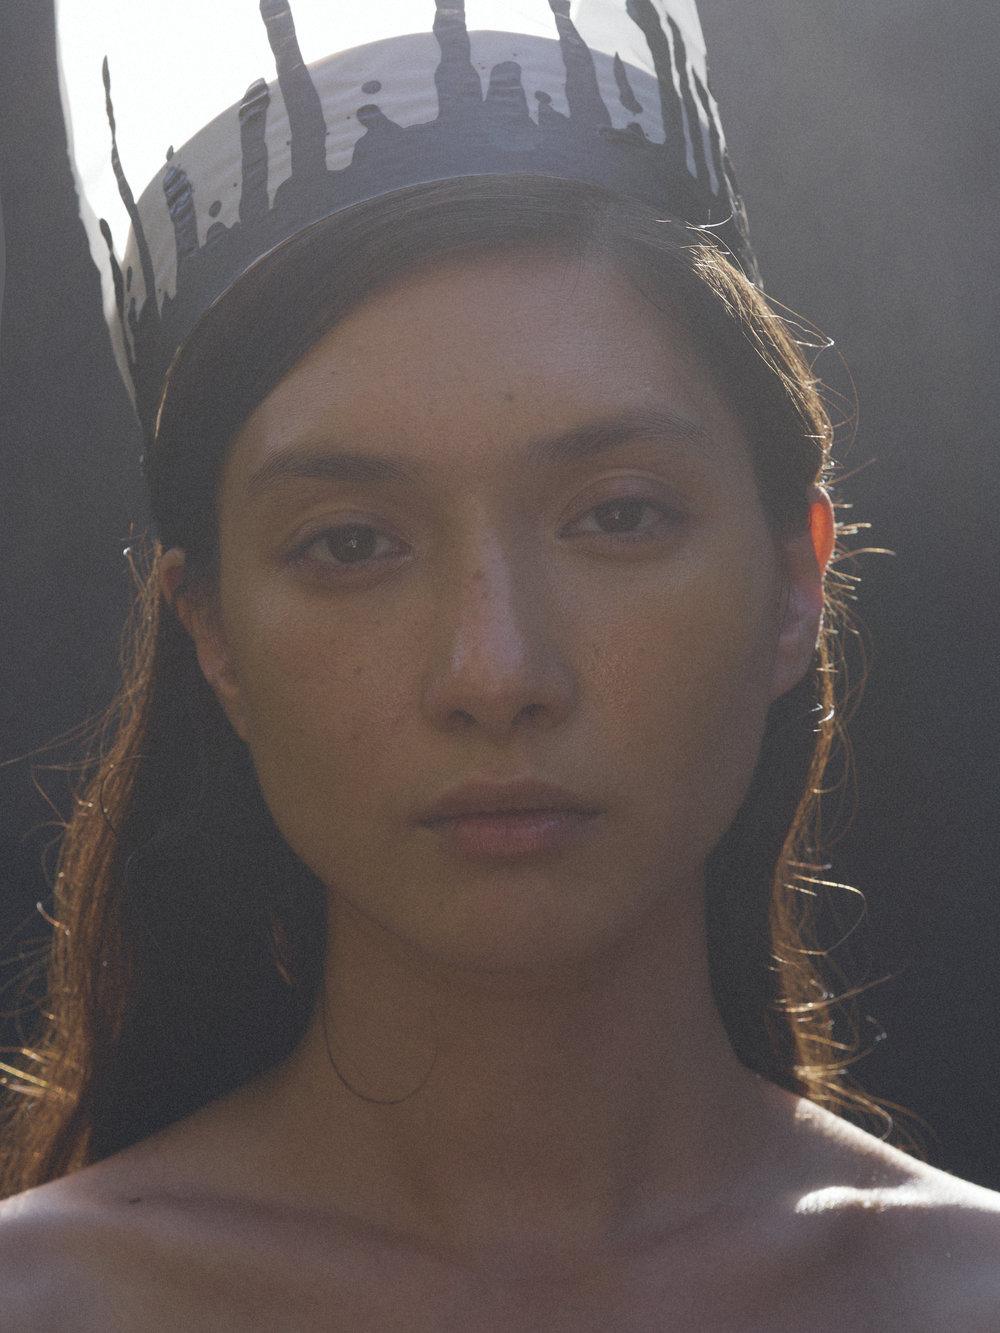 Noemi by Kristin Vicari wearing Camp Fire Glow Serum on the cheeks. Beauty and crown by Khandiz Joni